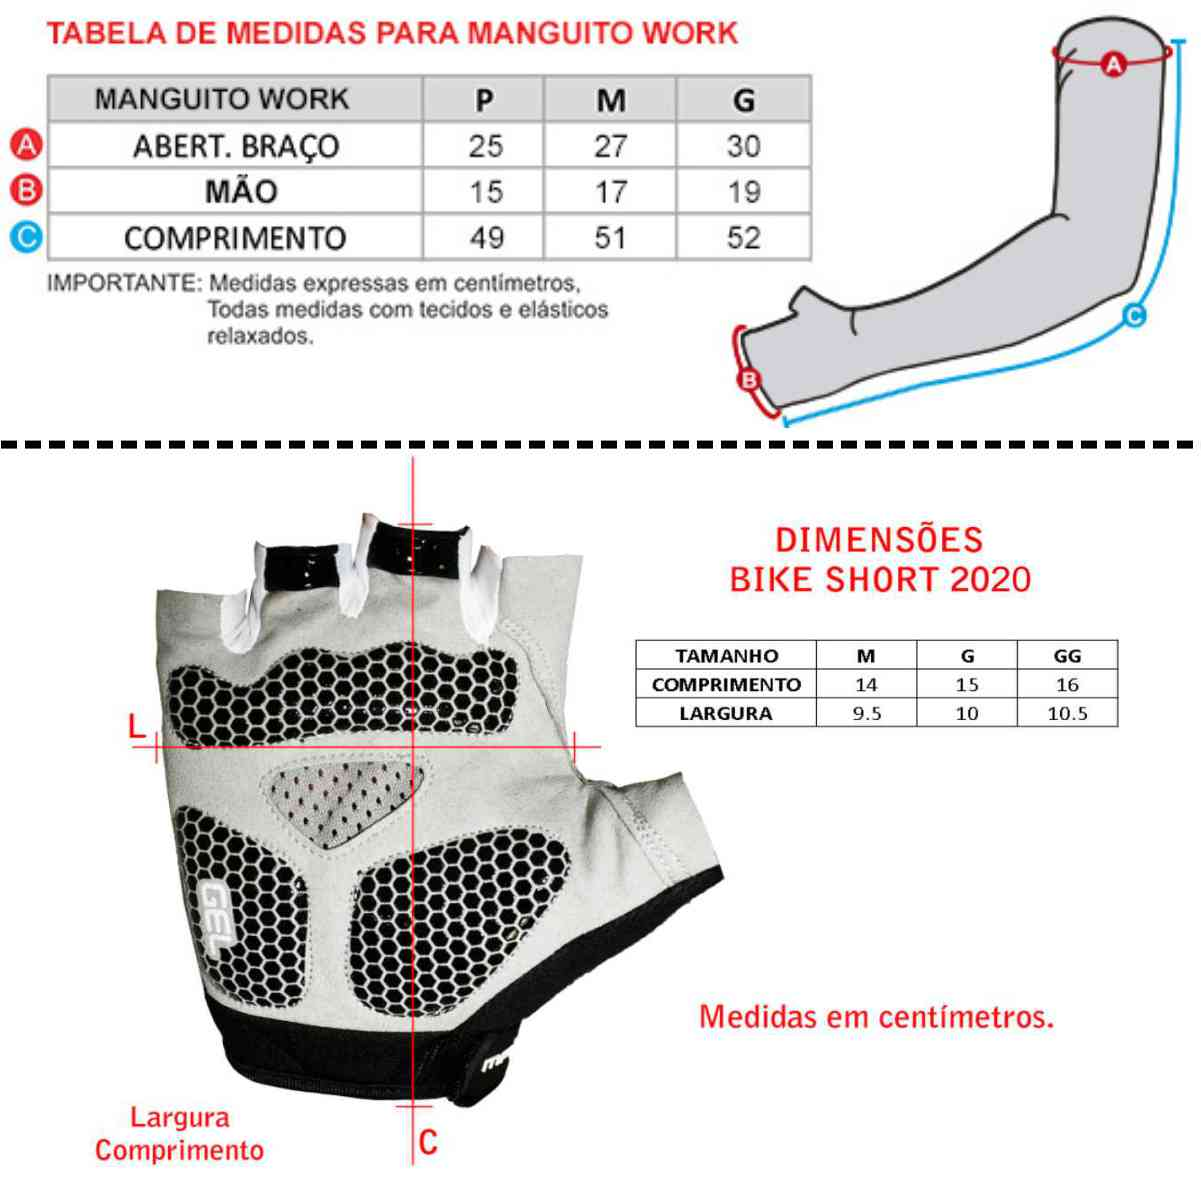 LUVA MATTOS RACING BIKE ECO MEIO DEDO PRETO + MANGUITO TÉRMICO BASEAGUA POLEGAR